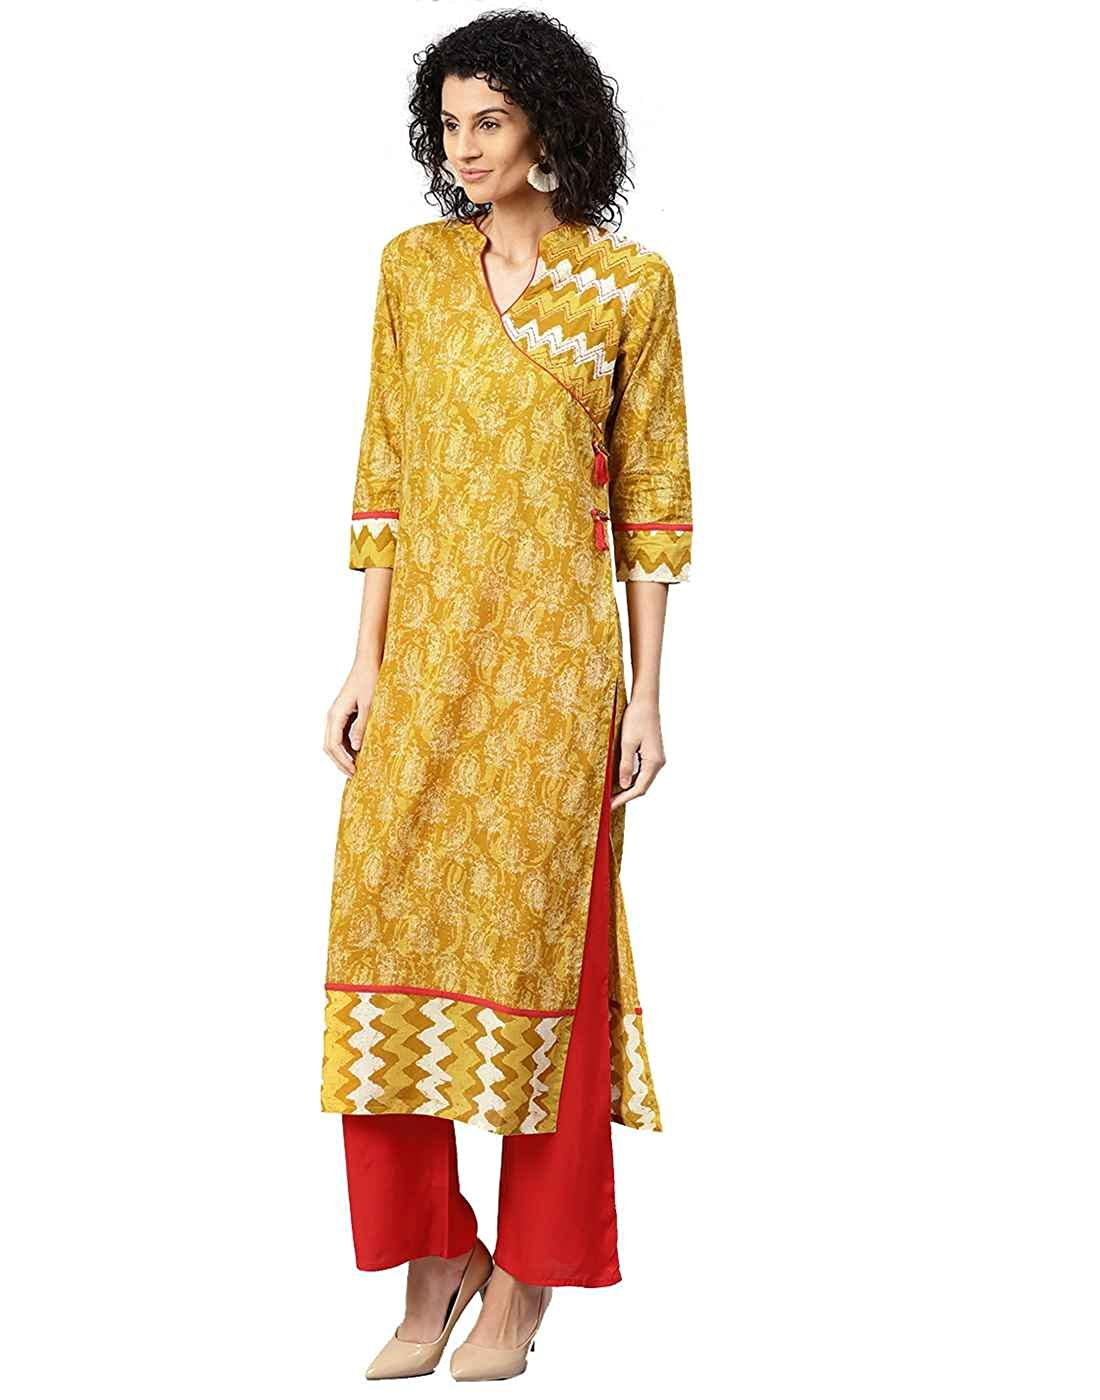 6f8584a91f0 Jaipur Kurti Women Ethnic Casual Abstract Top Tunic Dress Straight Cotton  Kurta   Palazzo (Mustard   Red) at Amazon Women s Clothing store